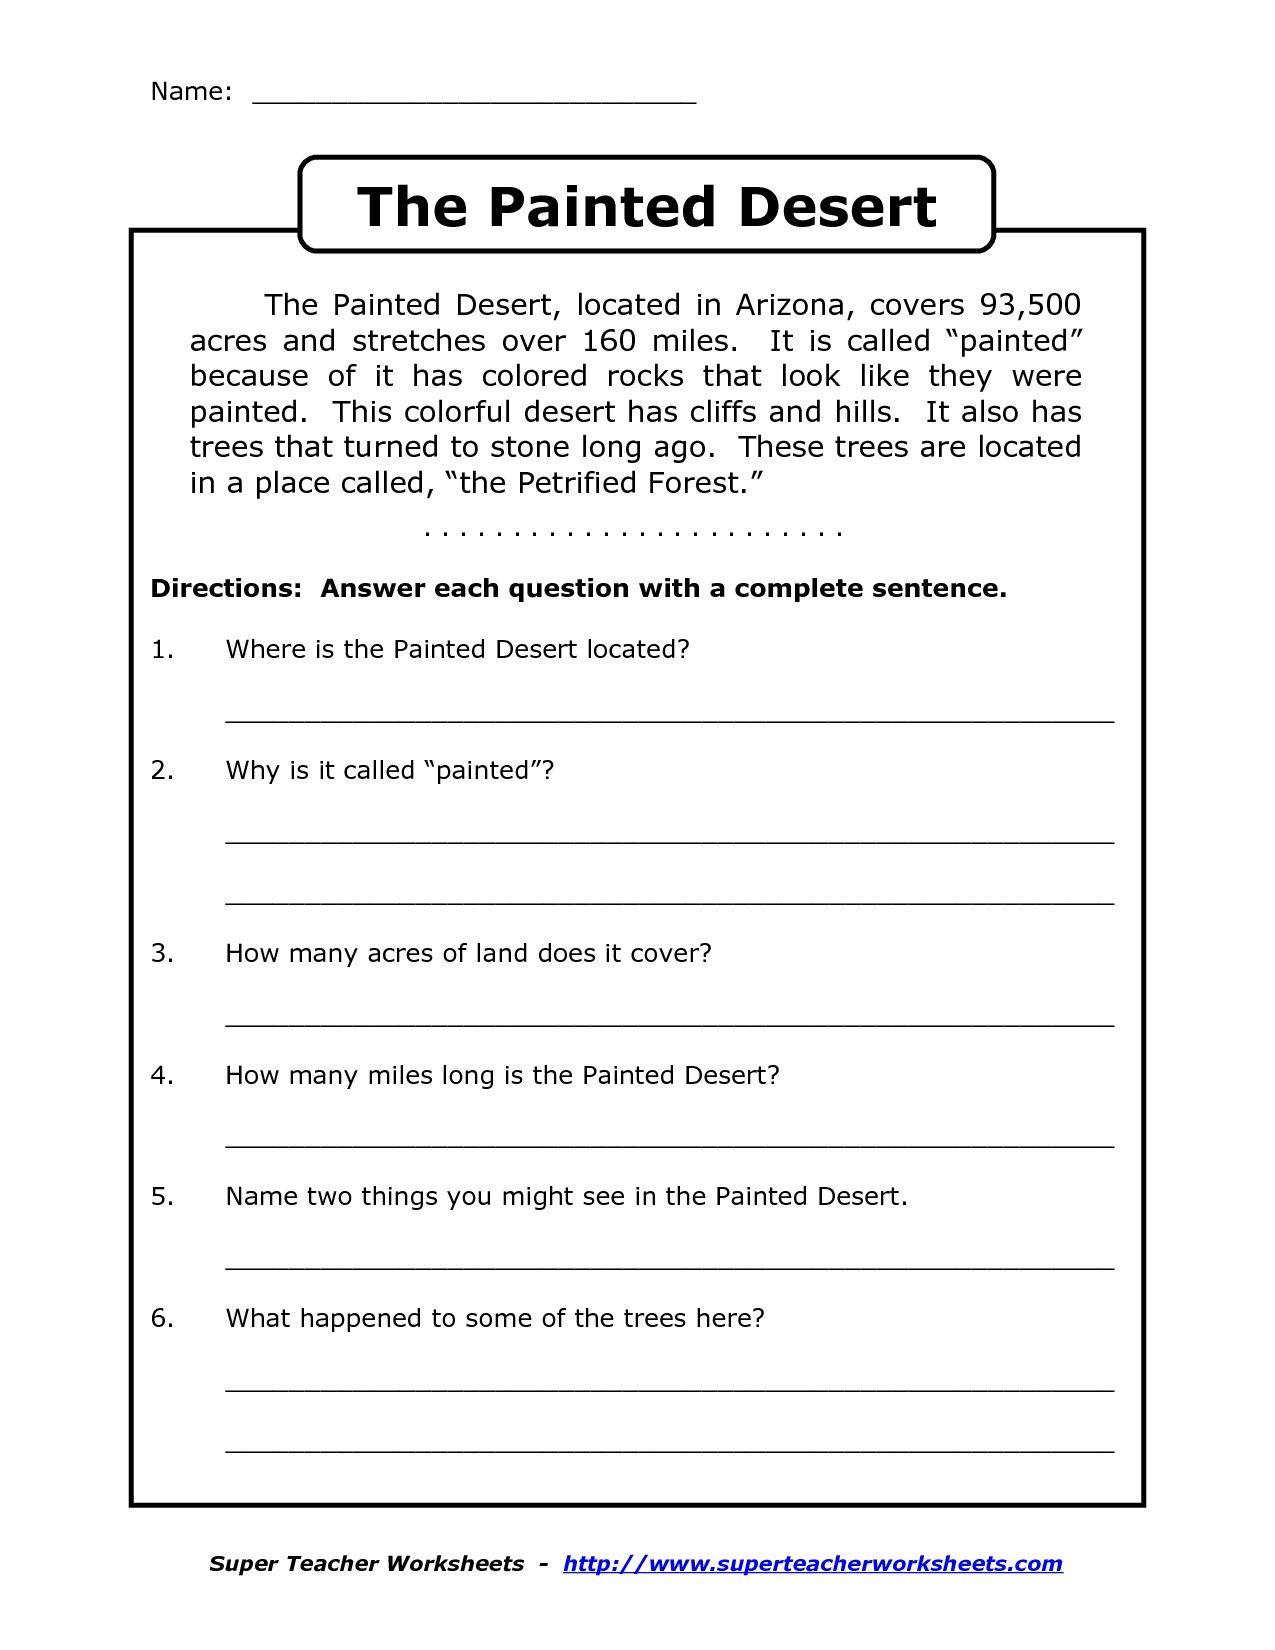 Free Printable English Comprehension Worksheets For Grade 4